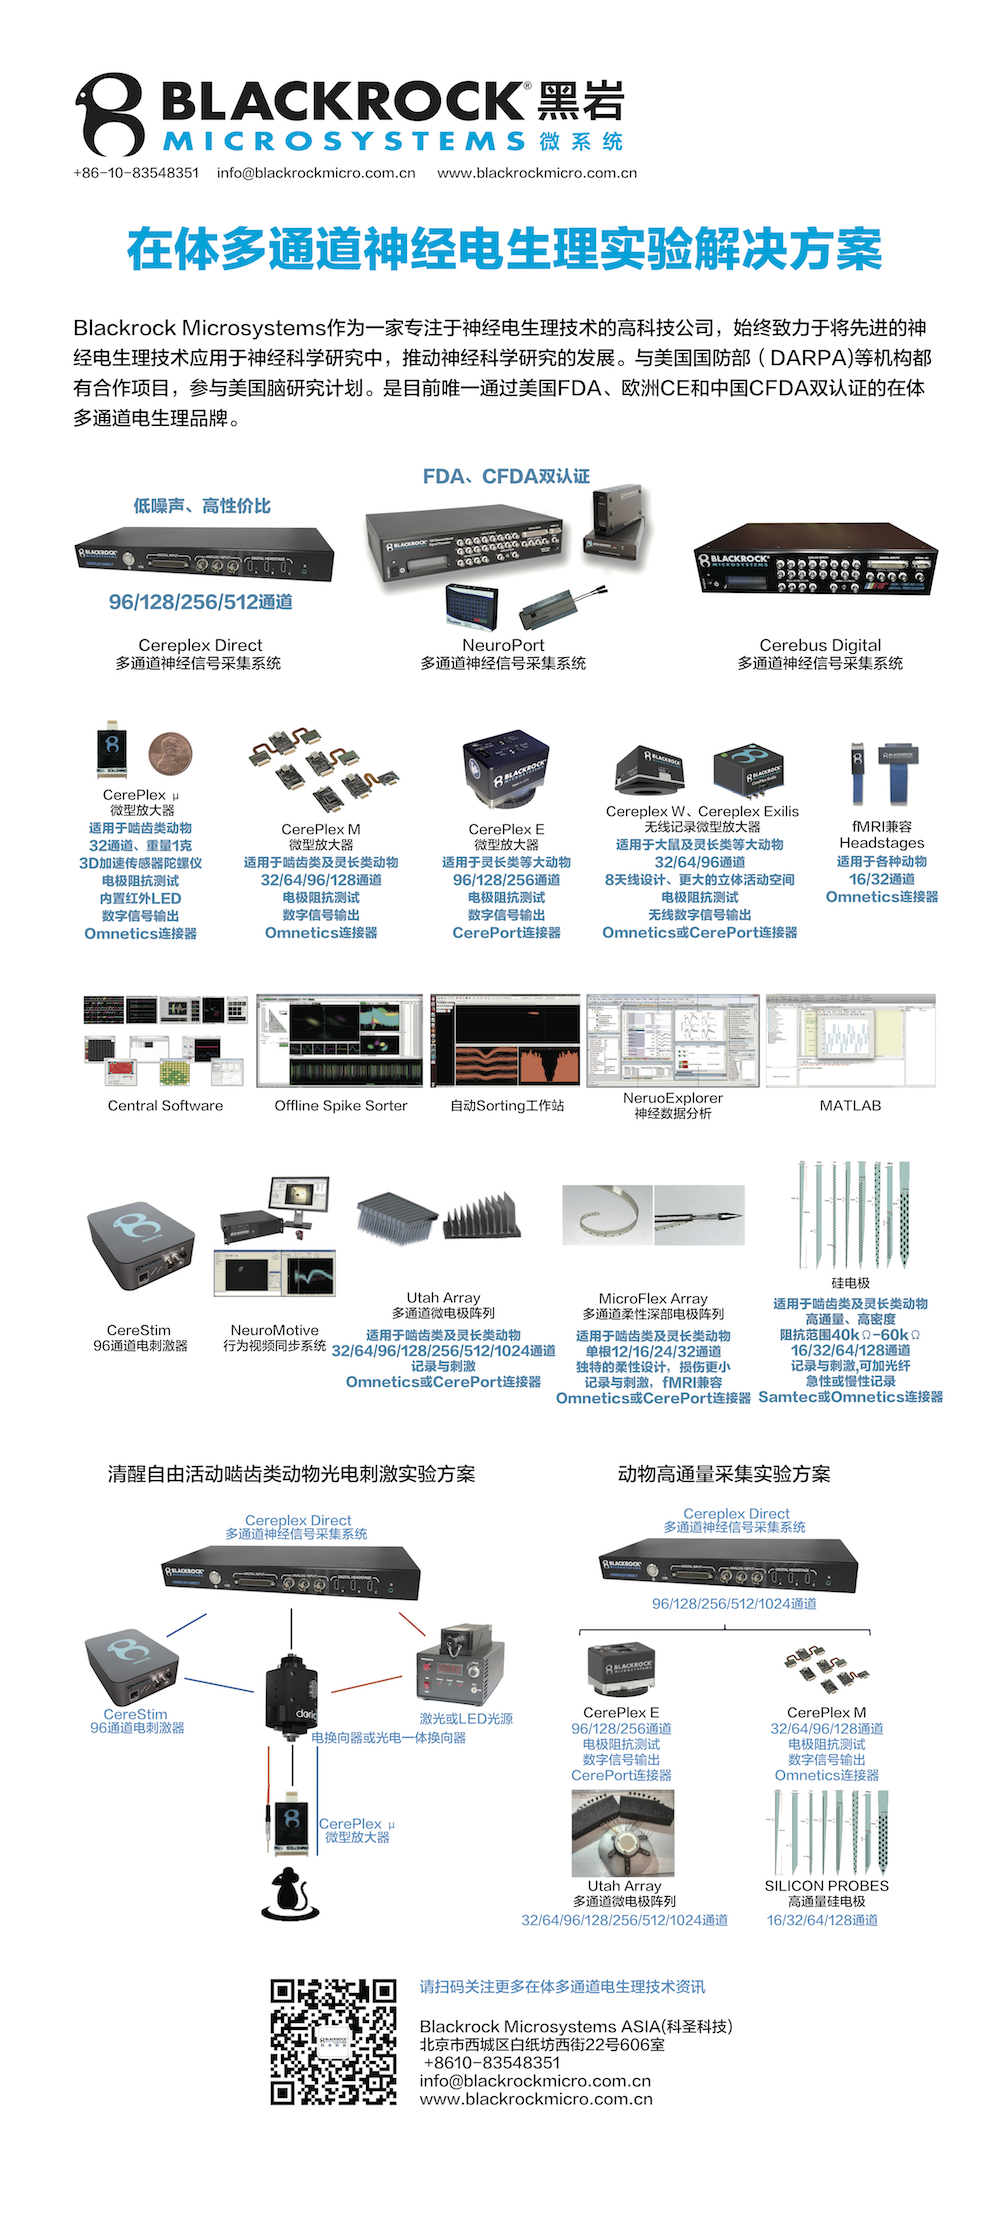 Blackrockmicrosystems在体电生理产品概括-20191104